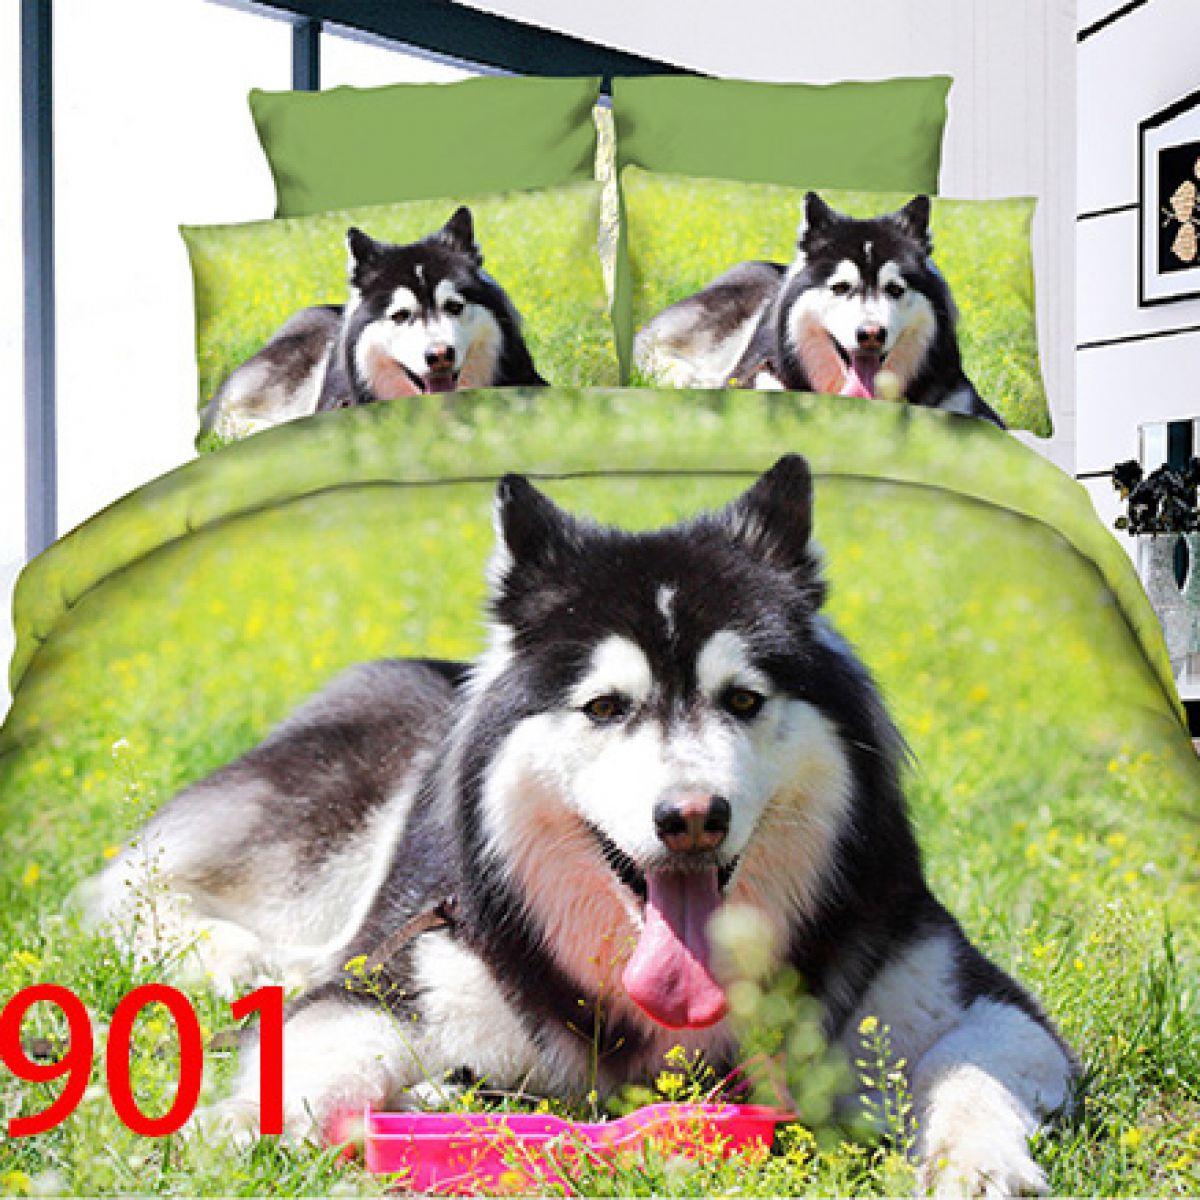 3D Beddings - Antonio - AML-901 - 140x200 cm - 2 pcs